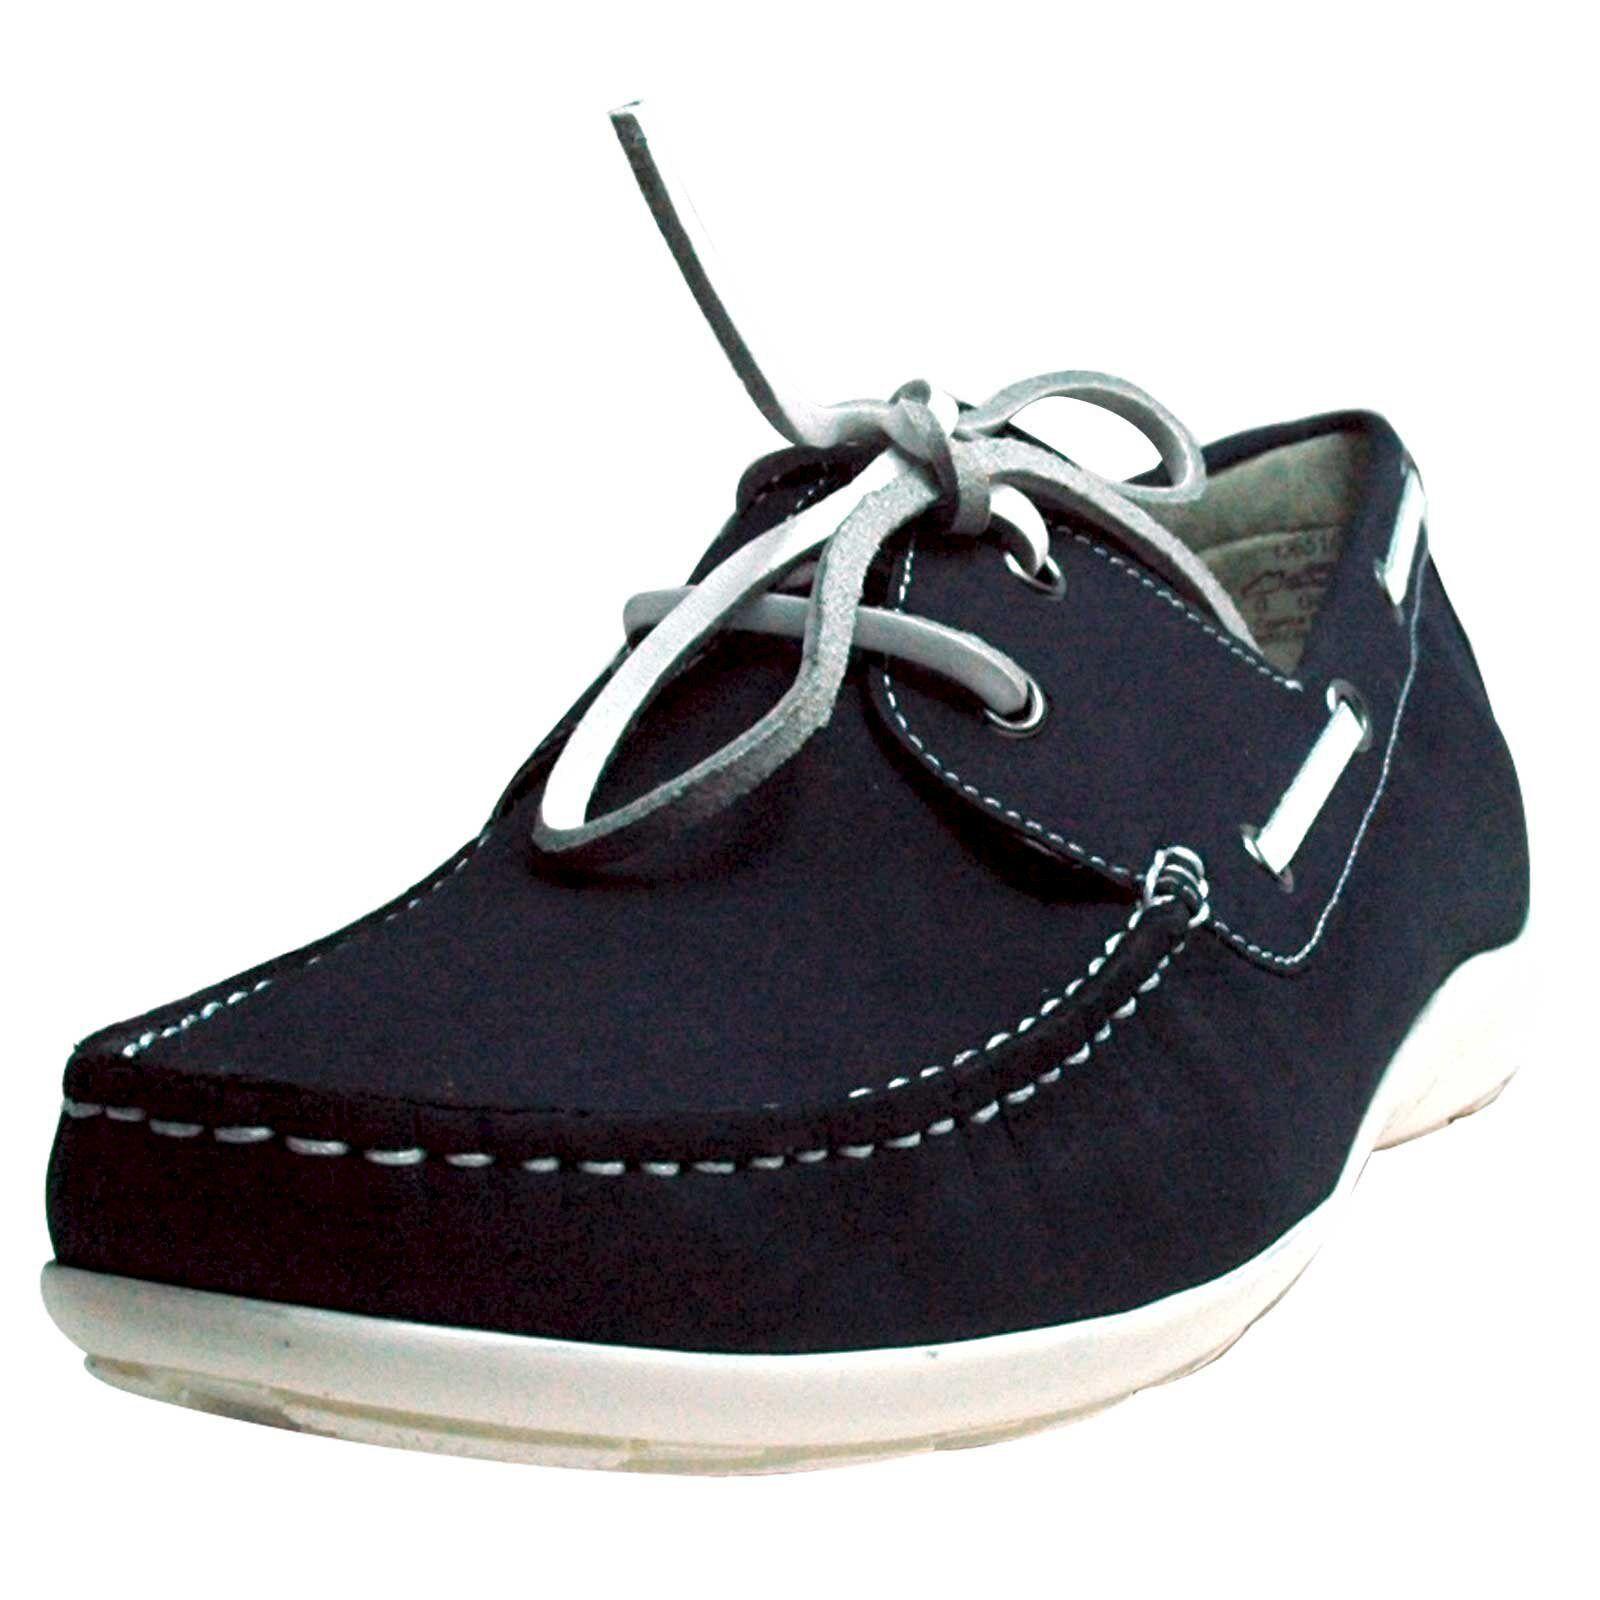 Billig hohe Qualität Caprice Herren-Mokassins navy- blau, air-4-men